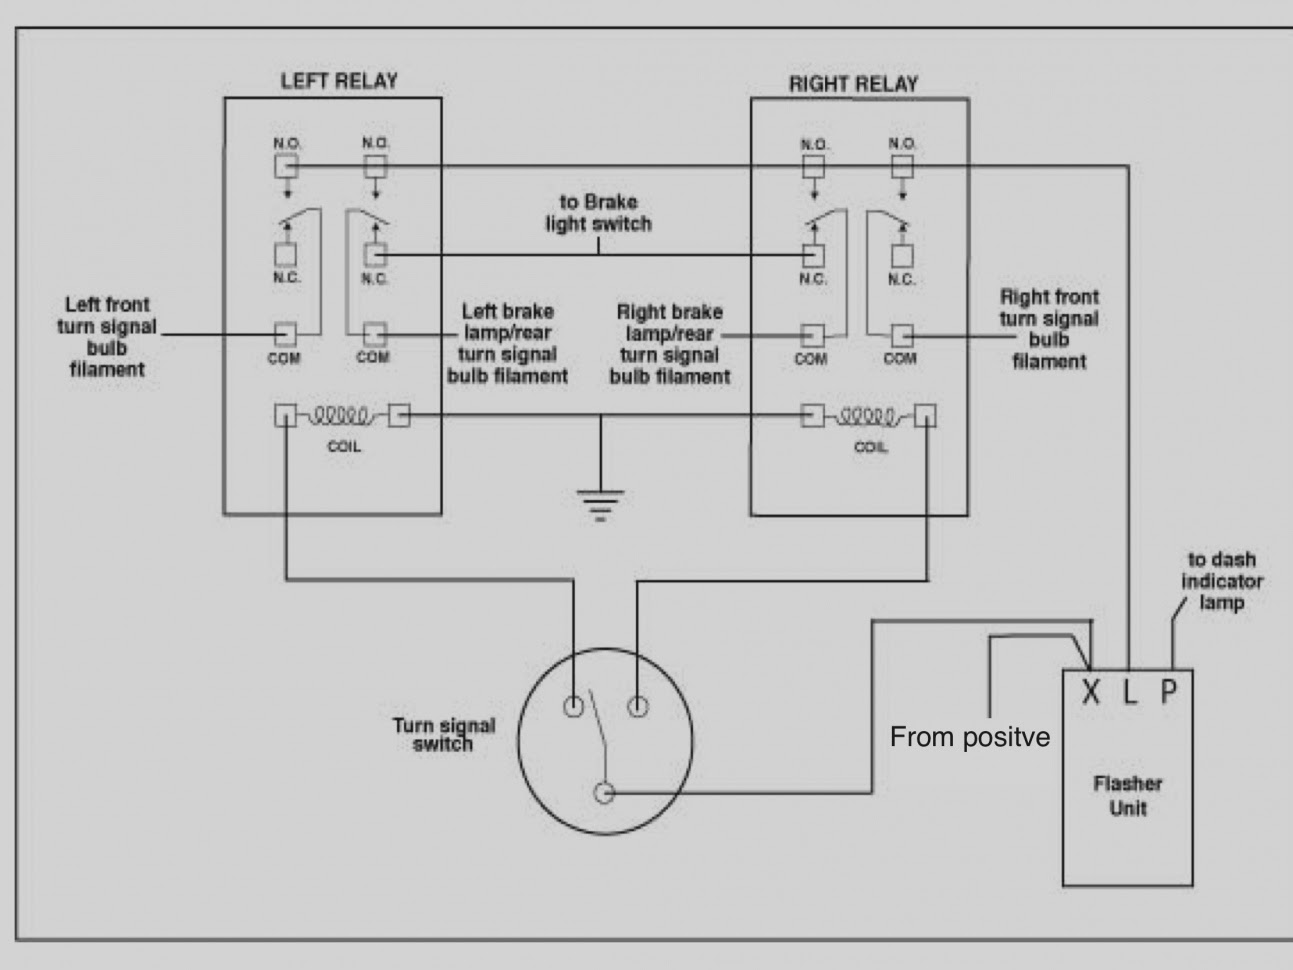 2015 Polaris Ranger Wiring Diagram Wiring Diagram Frankmotors Es